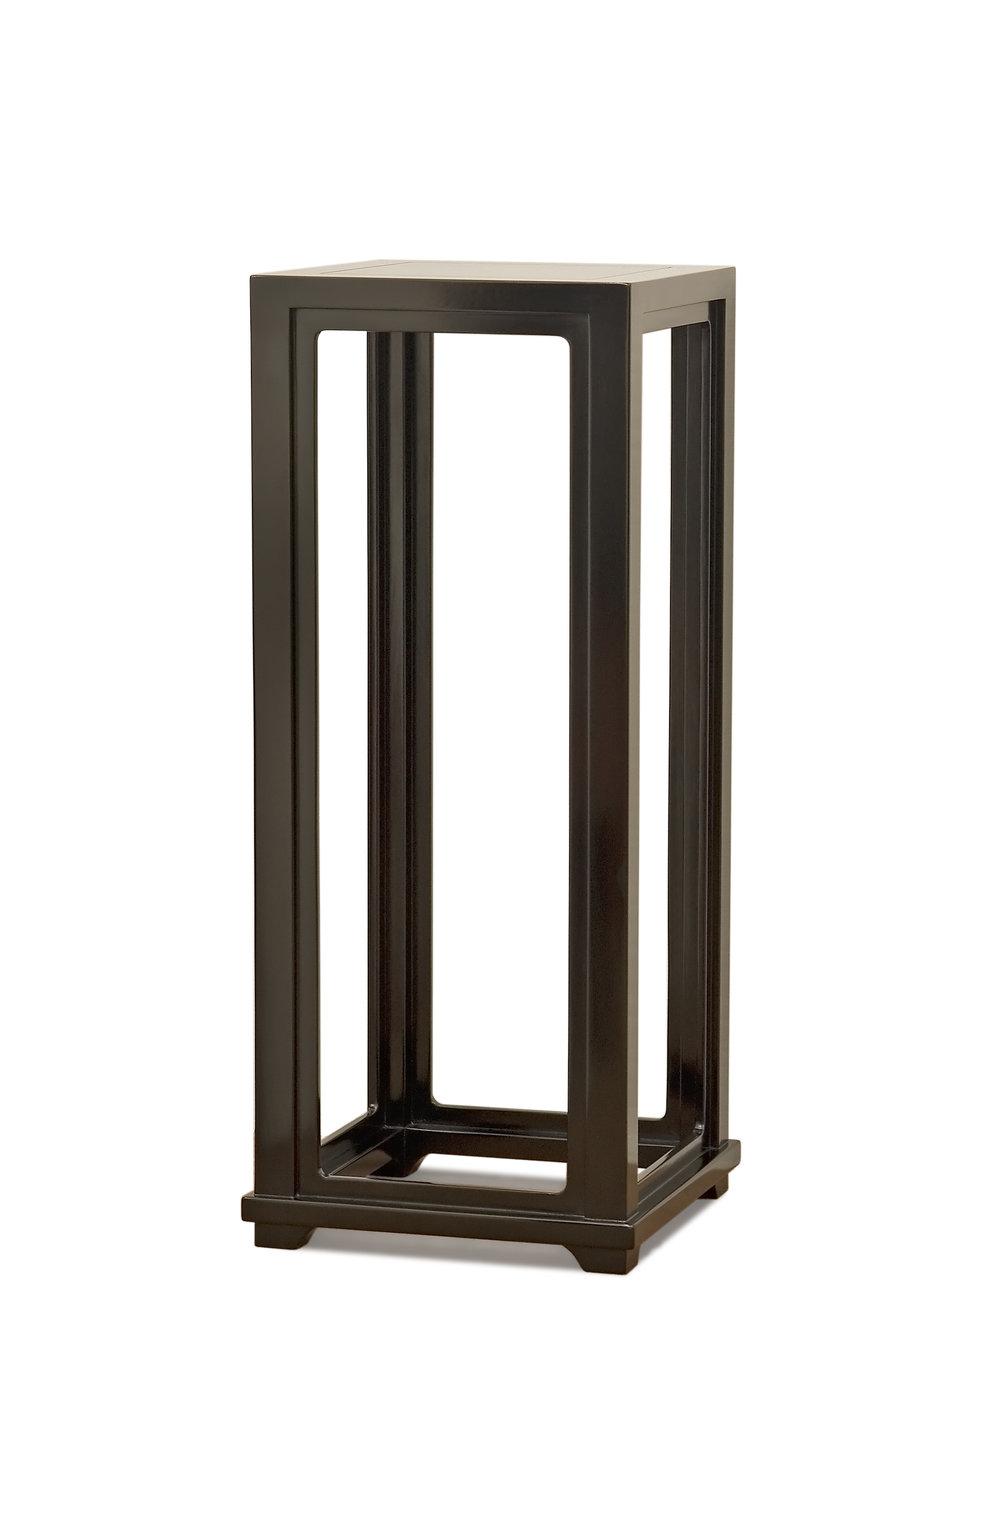 ....chinese furniture : stand..中式家具 : 花几....